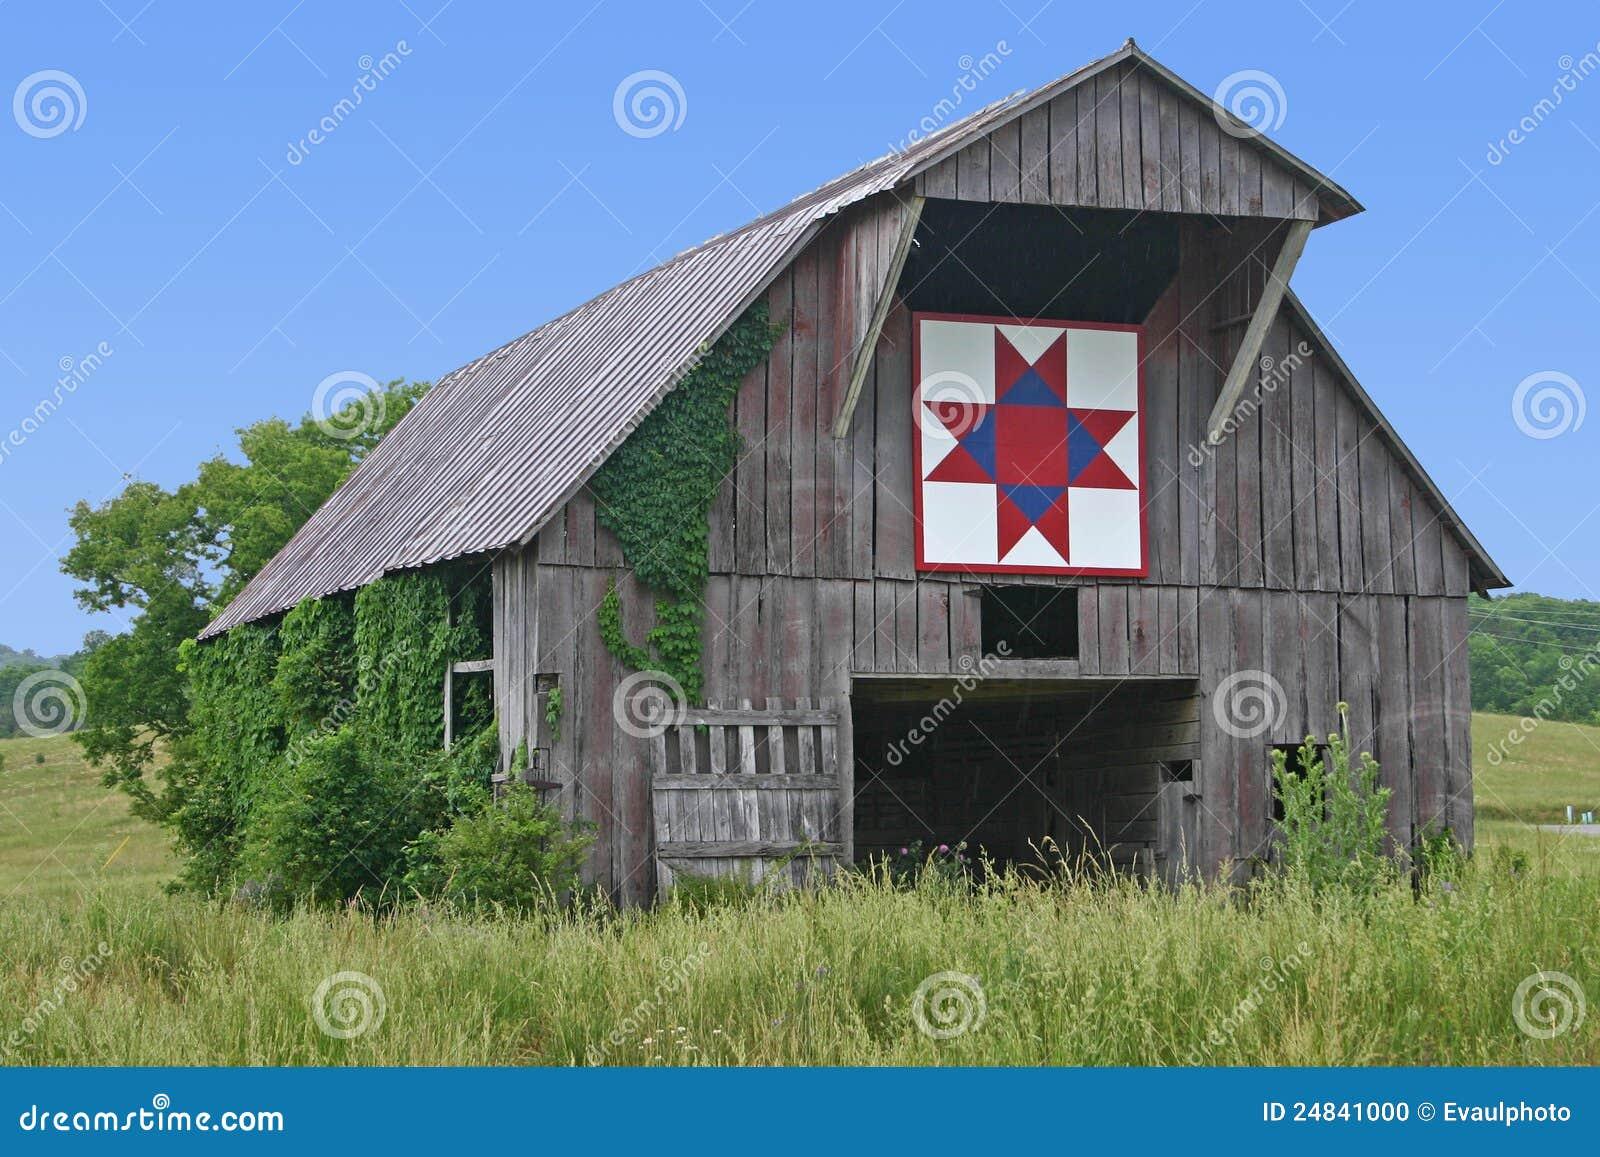 Ohio Star Quilt Block Stock Photo Image Of Cover Farm